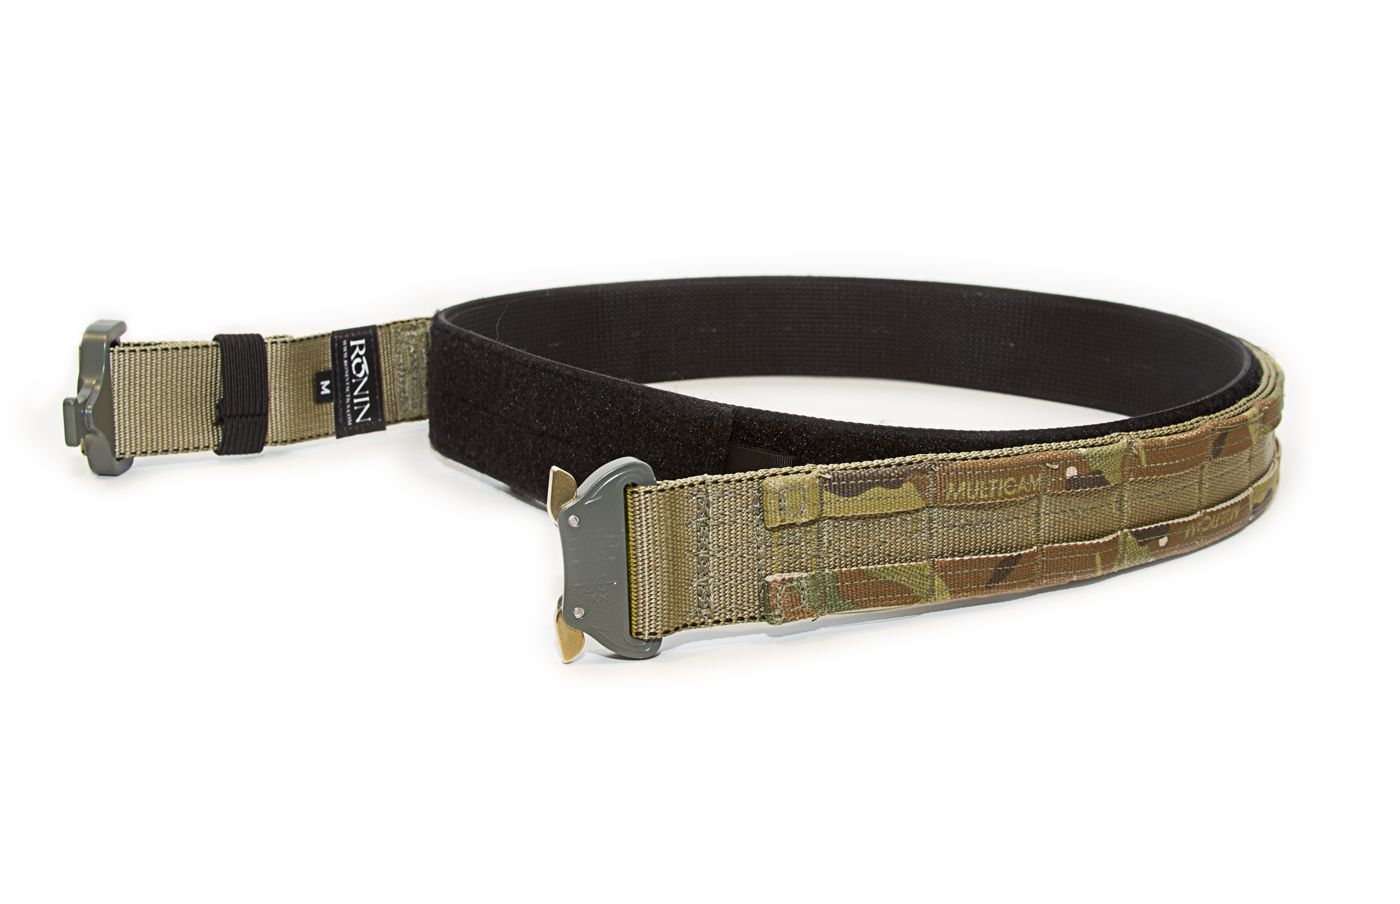 Ronin Tactics Shooter's Belt - 2 layer combination ensures ...